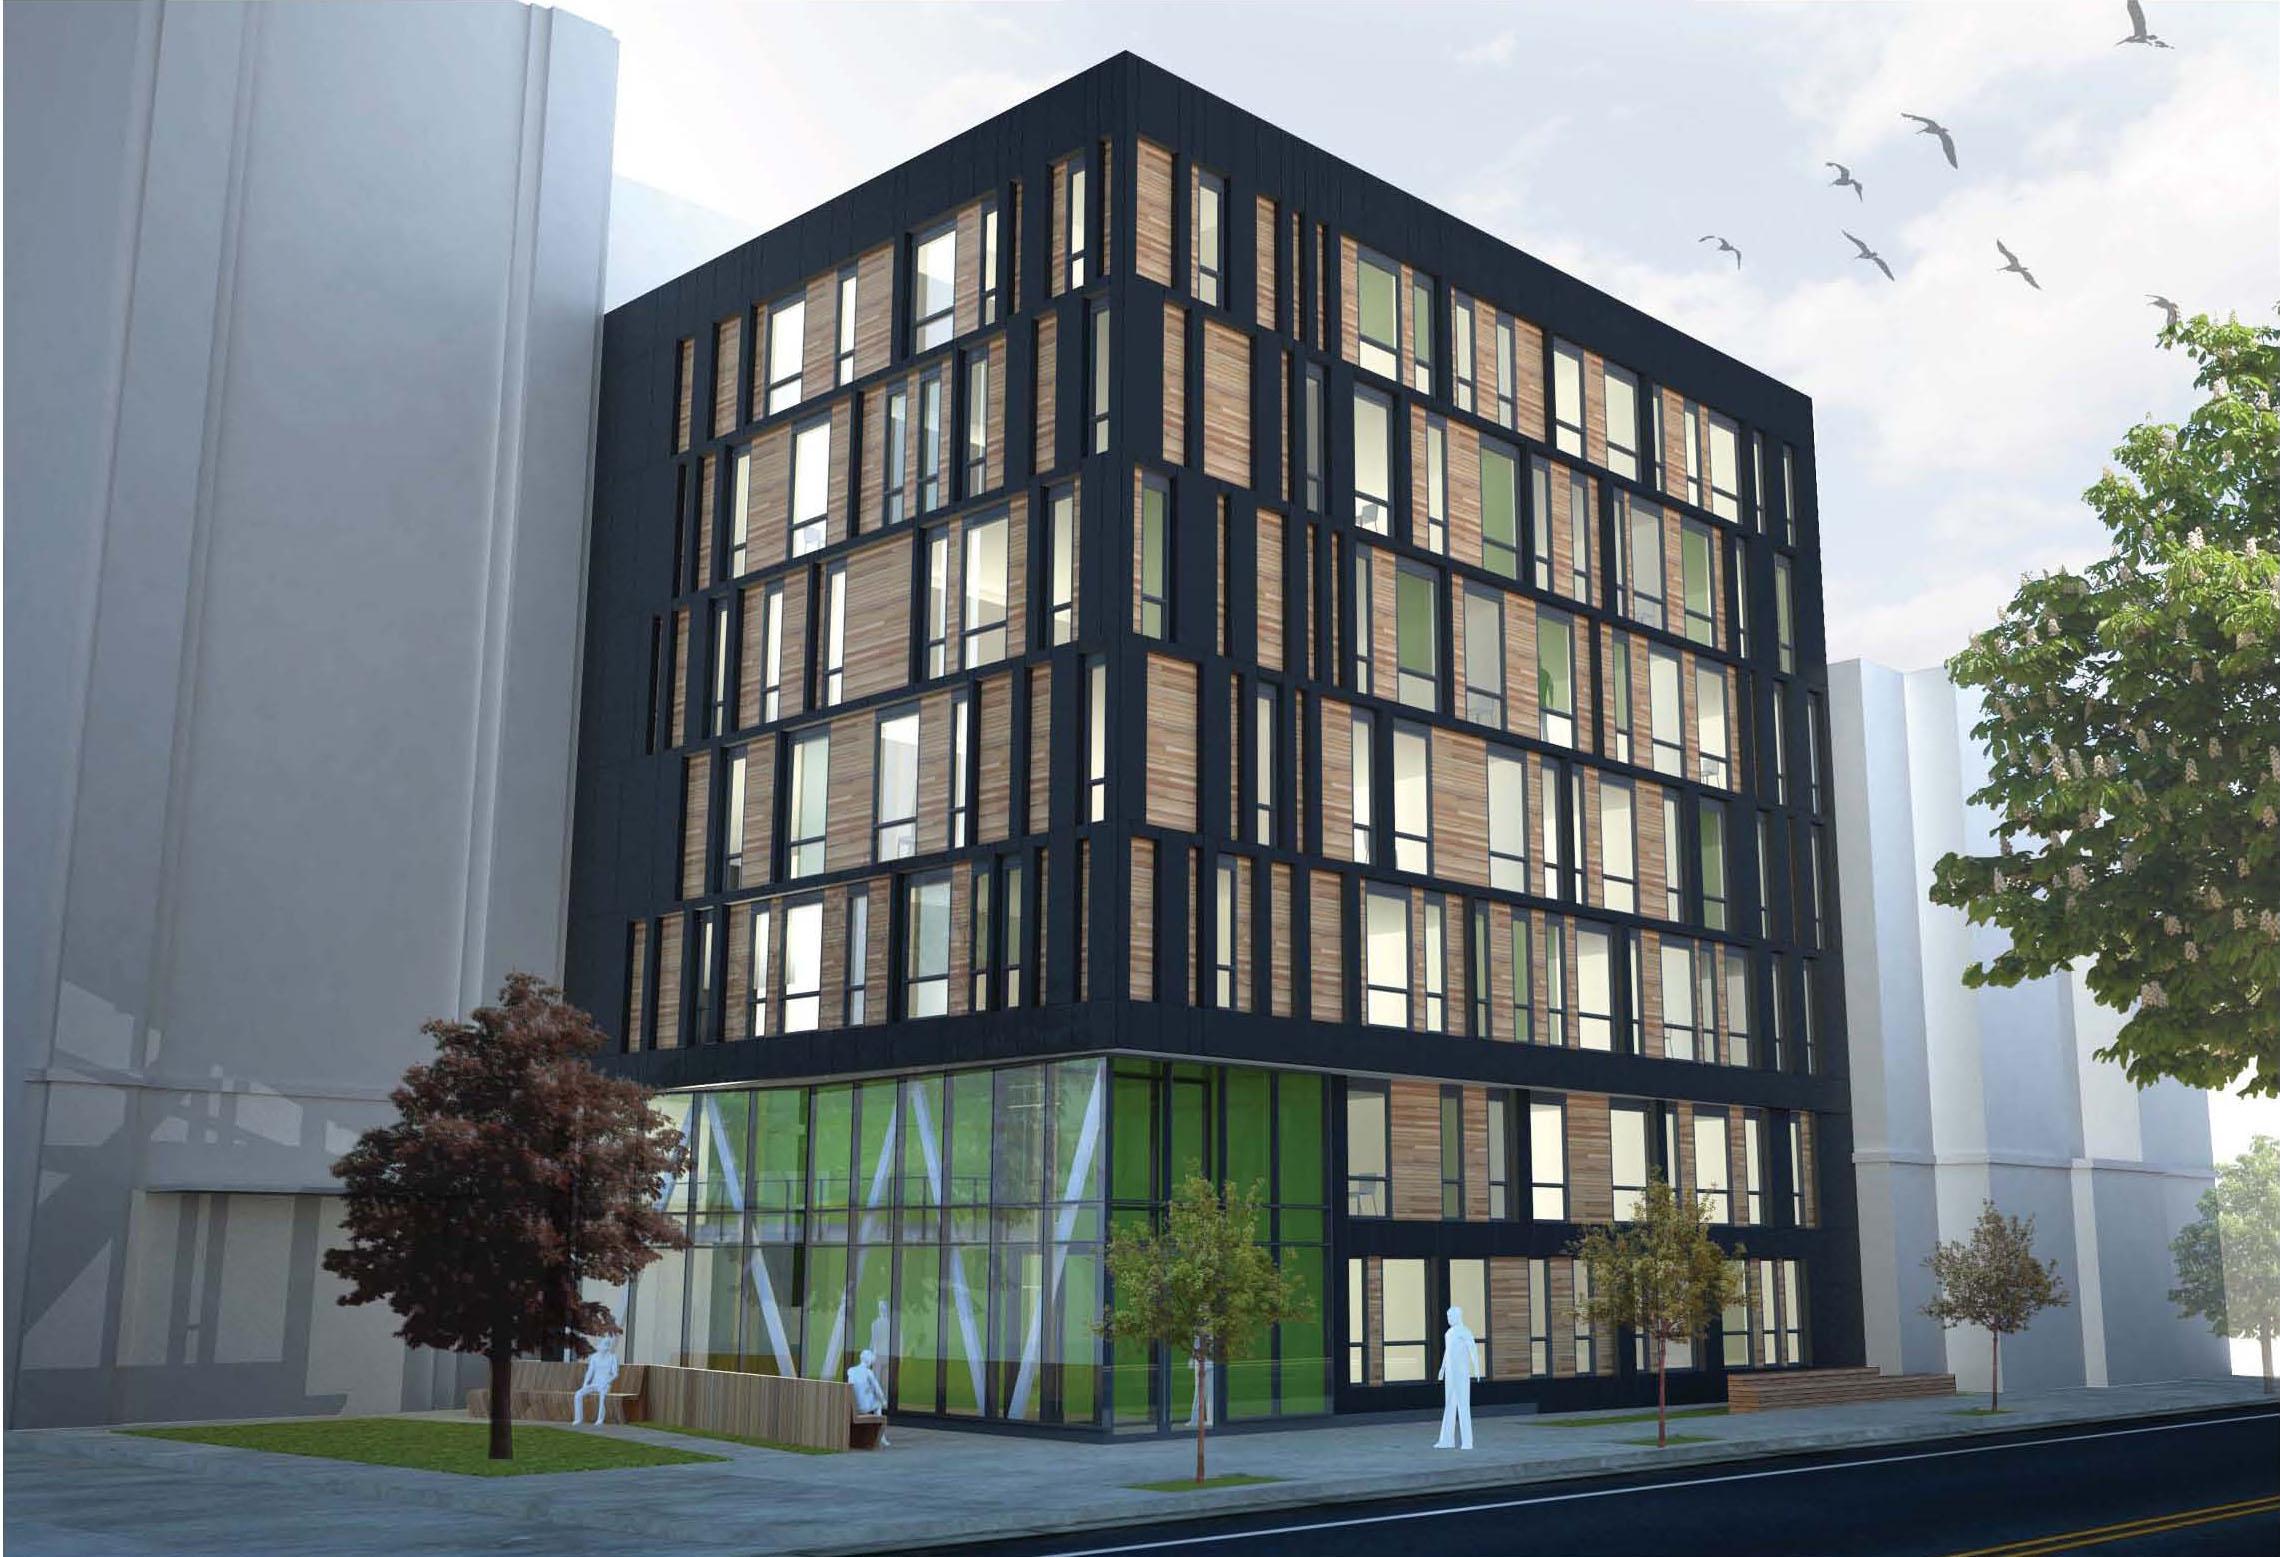 'La Casa' Habitação de Apoio / Studio Twenty Seven Architecture + Leo A Daly, Cortesia Studio Twenty Seven Architecture + Leo A Daly